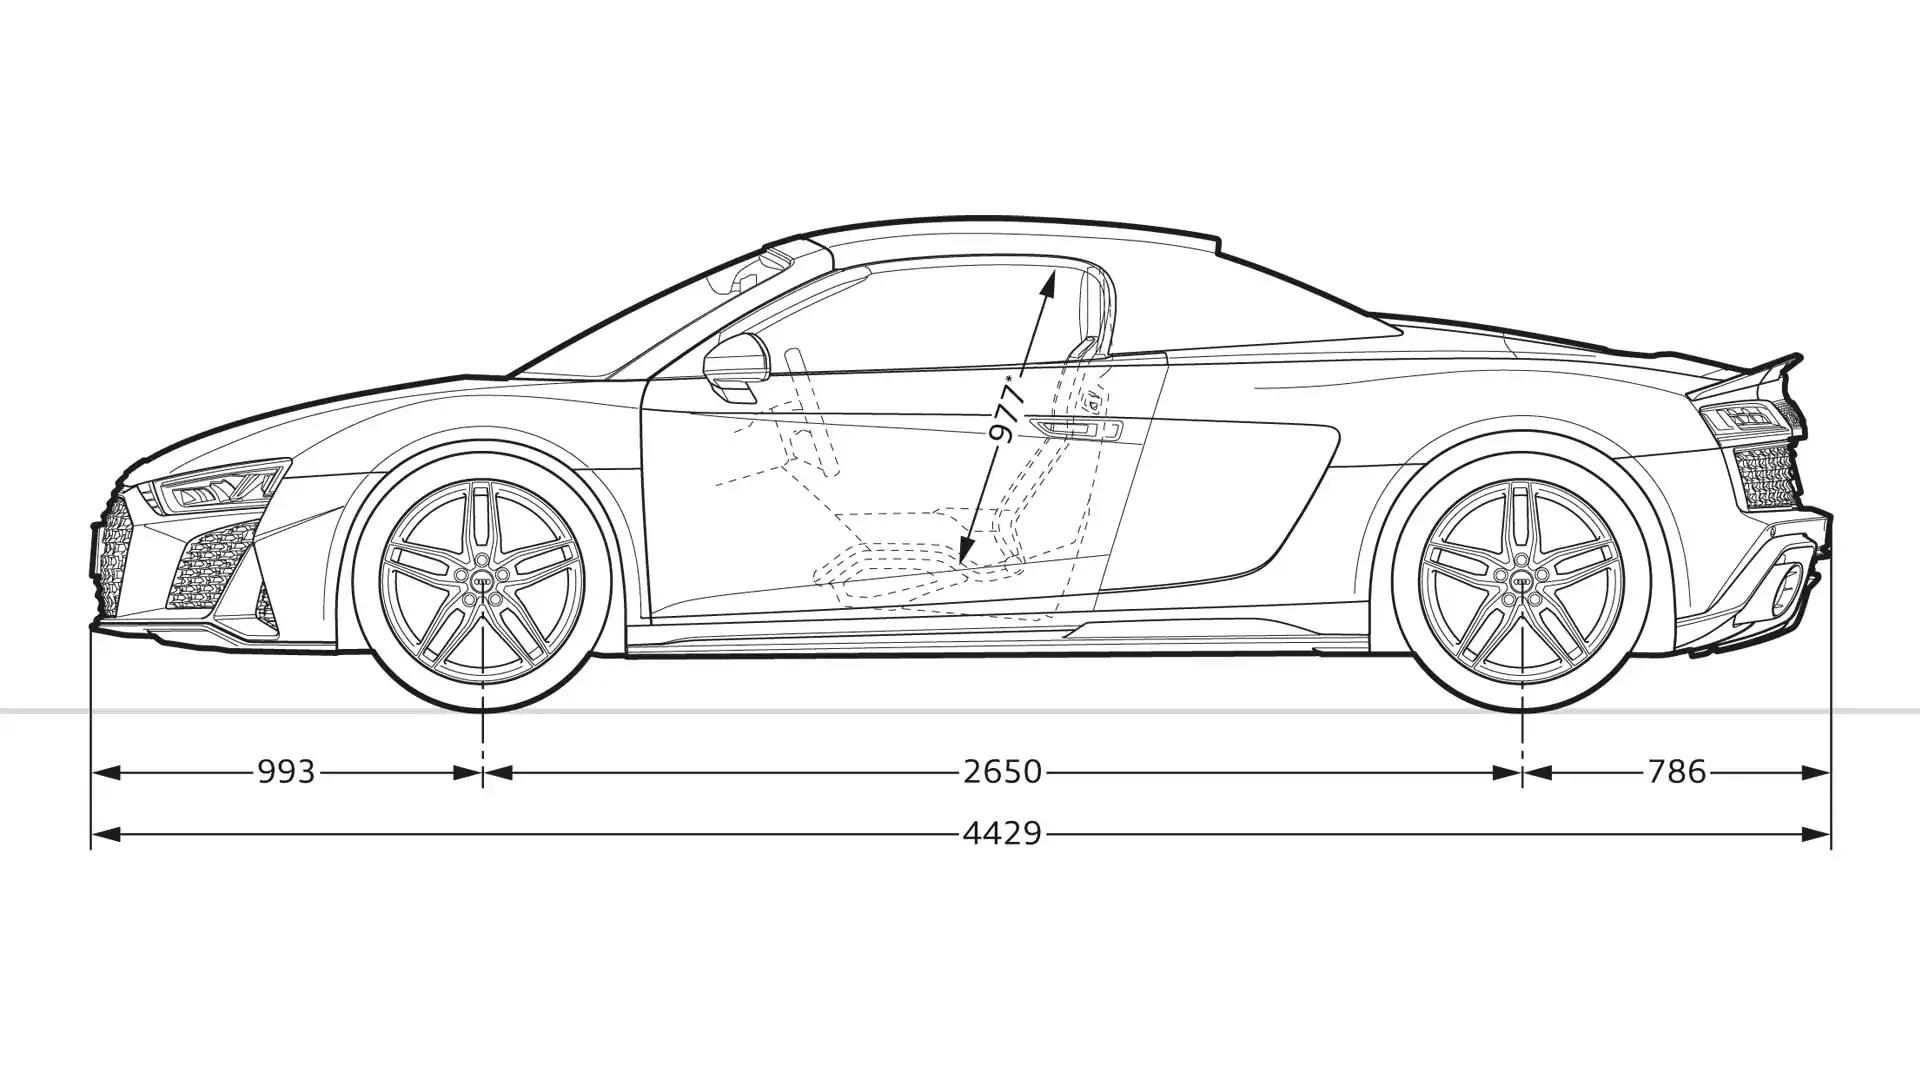 Abmessungen > R8 Spyder V10 quattro > R8 > Audi France